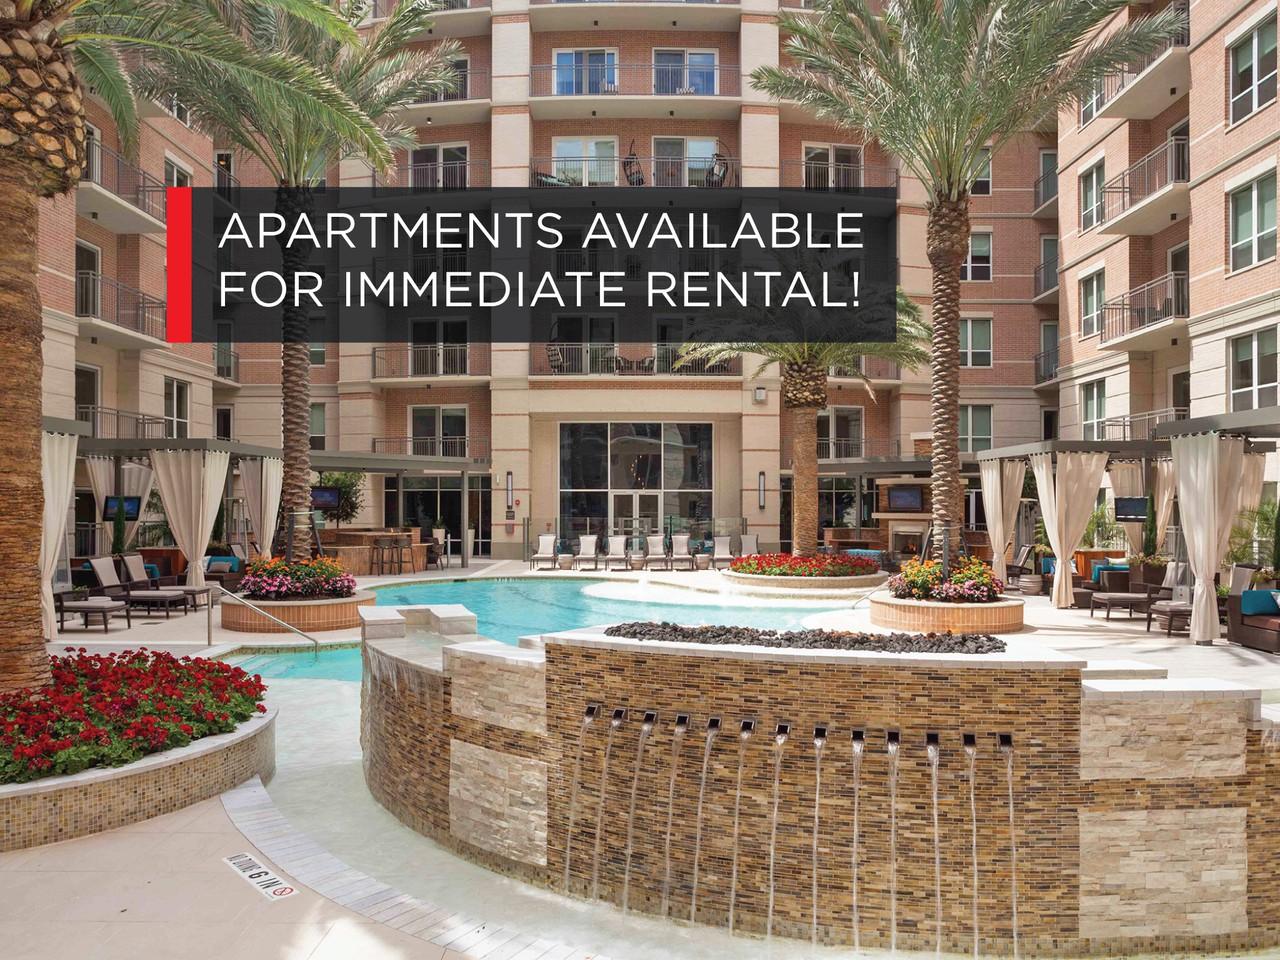 Gables River Oaks - 2724 Kipling St, Houston, TX 77098 - Apartment ...